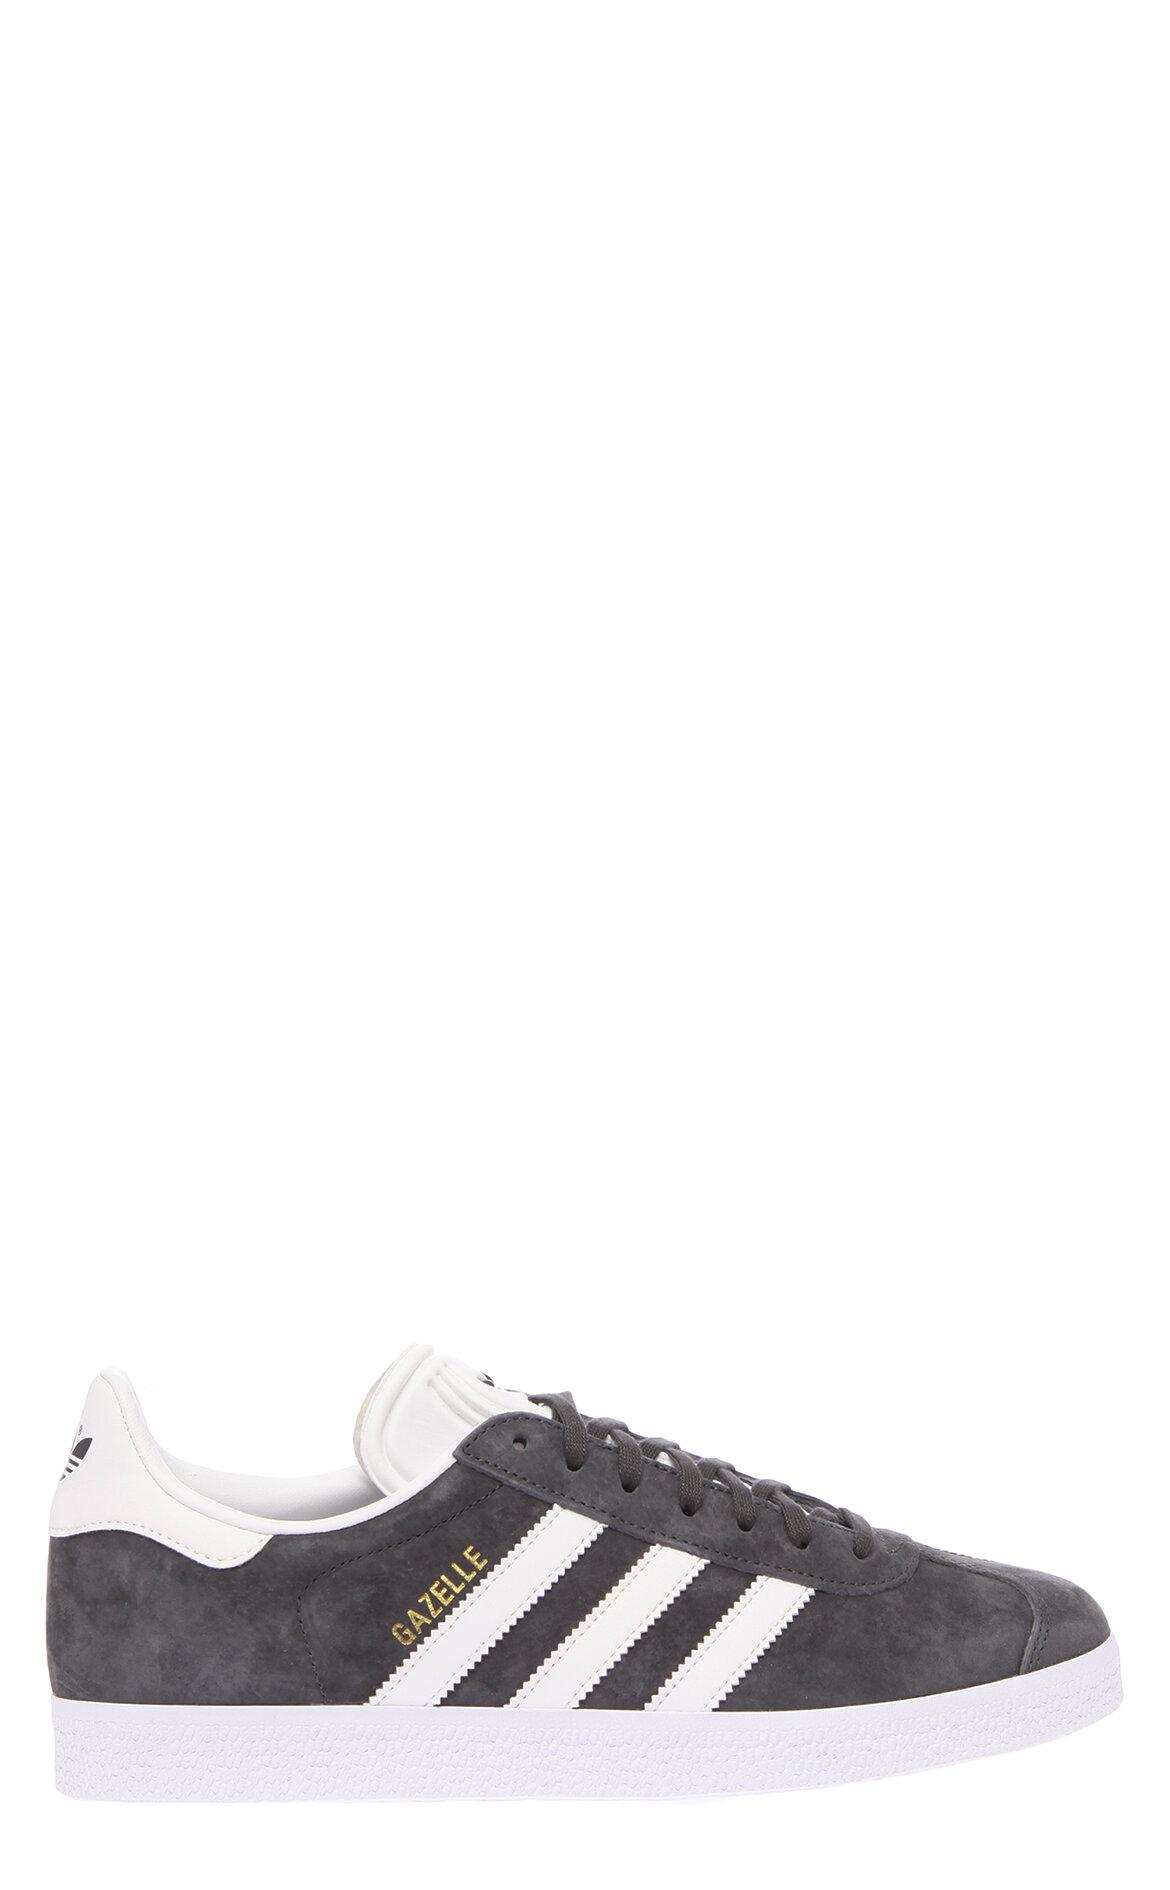 adidas originals-adidas originals Gazelle Spor Ayakkabı